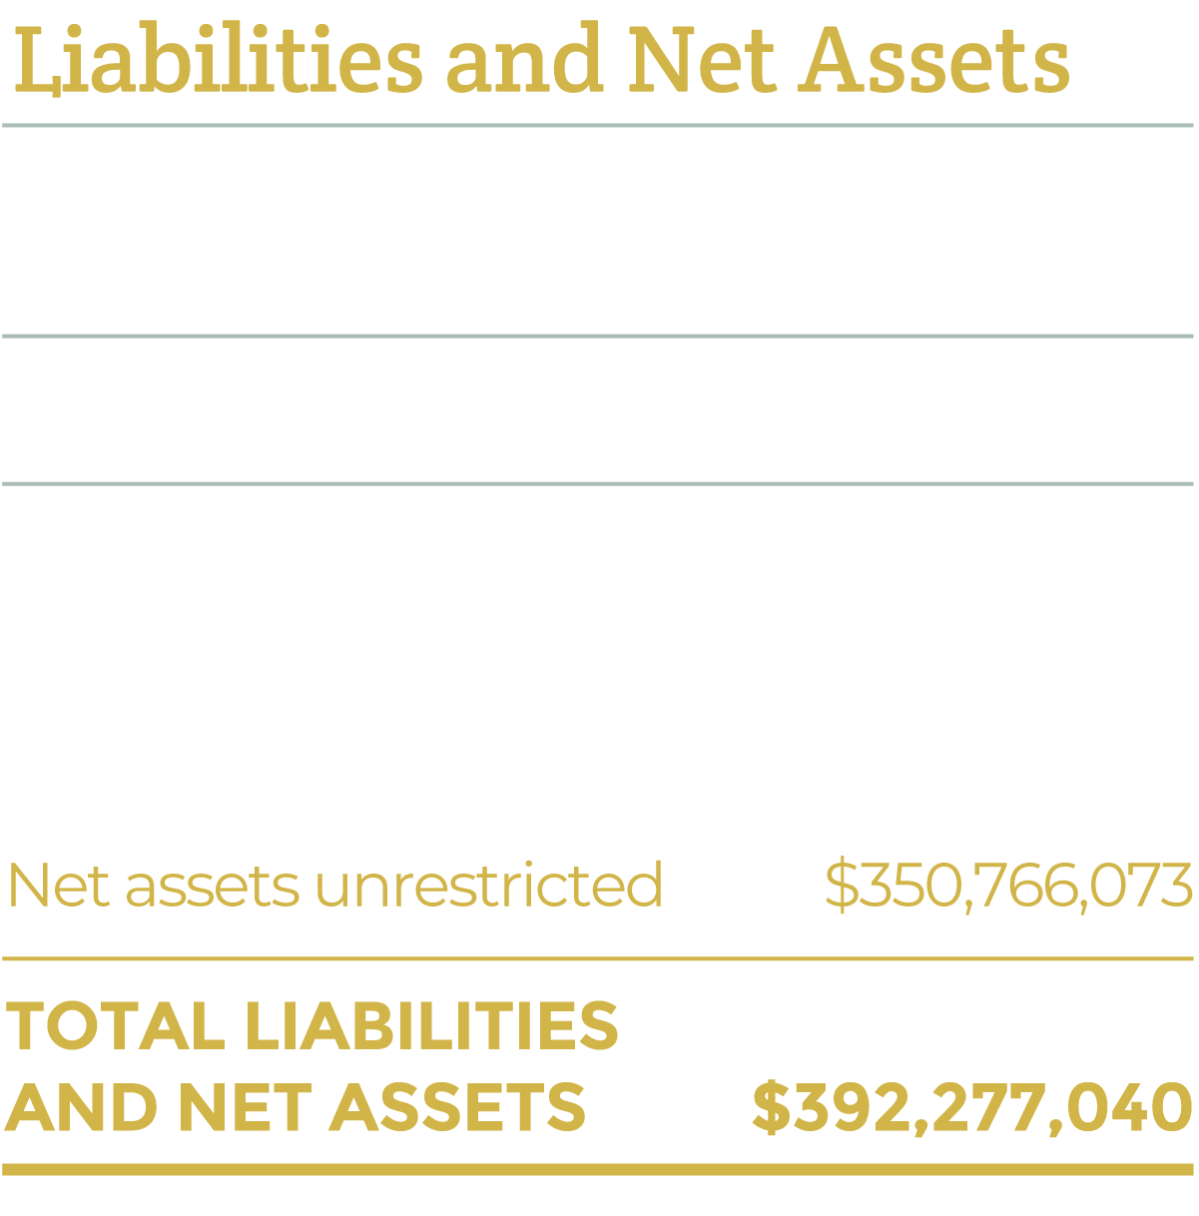 2018 Liabilities